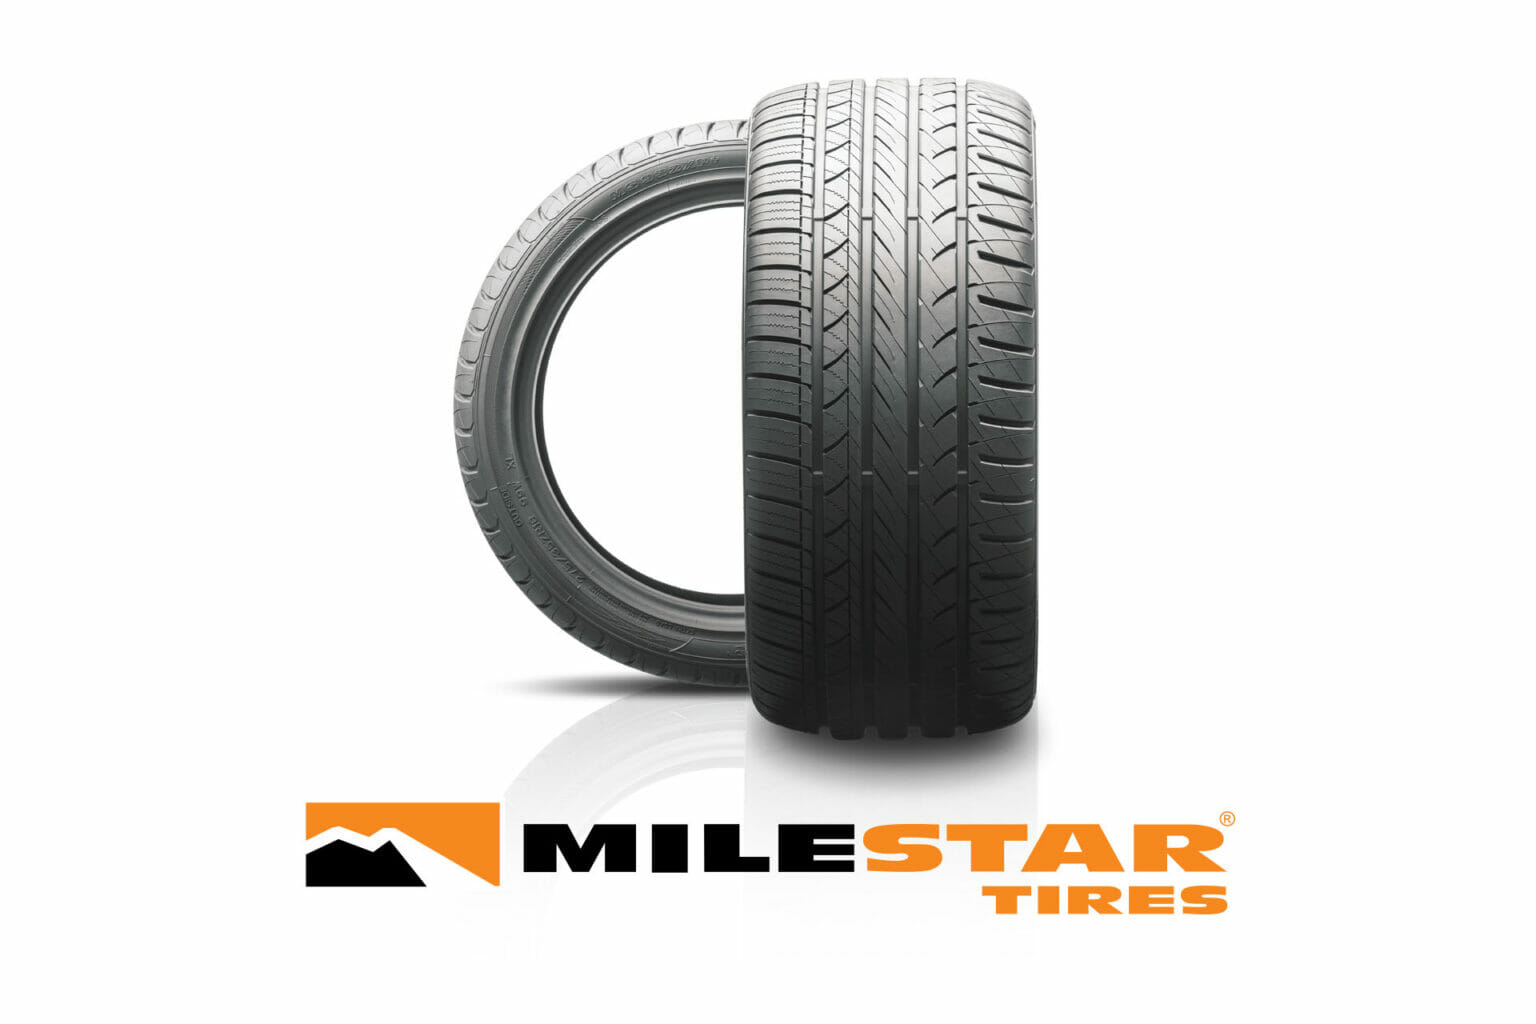 milestar ms932 sport performance touring tire